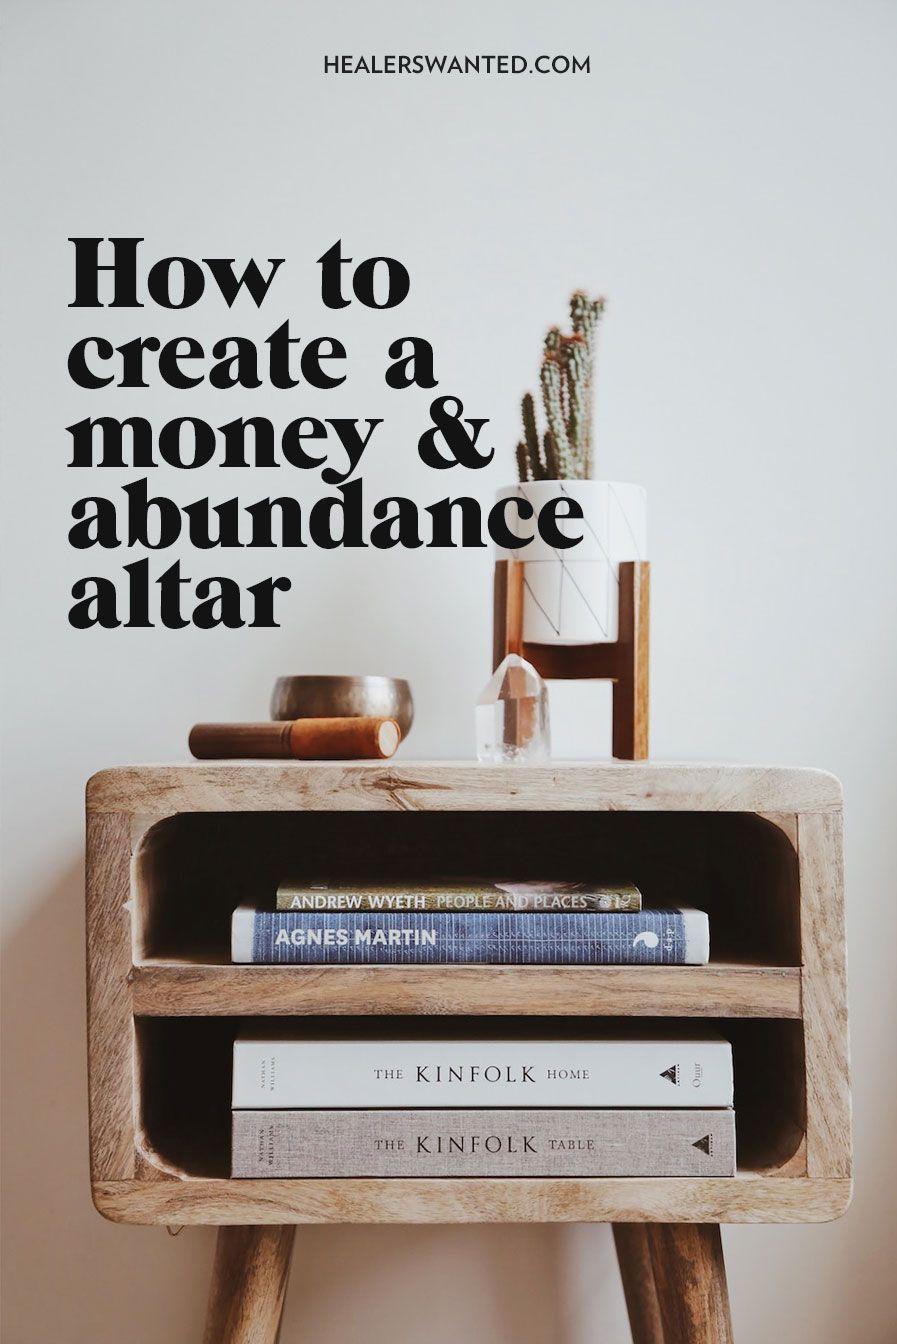 How to create a money altar spiritual tools for